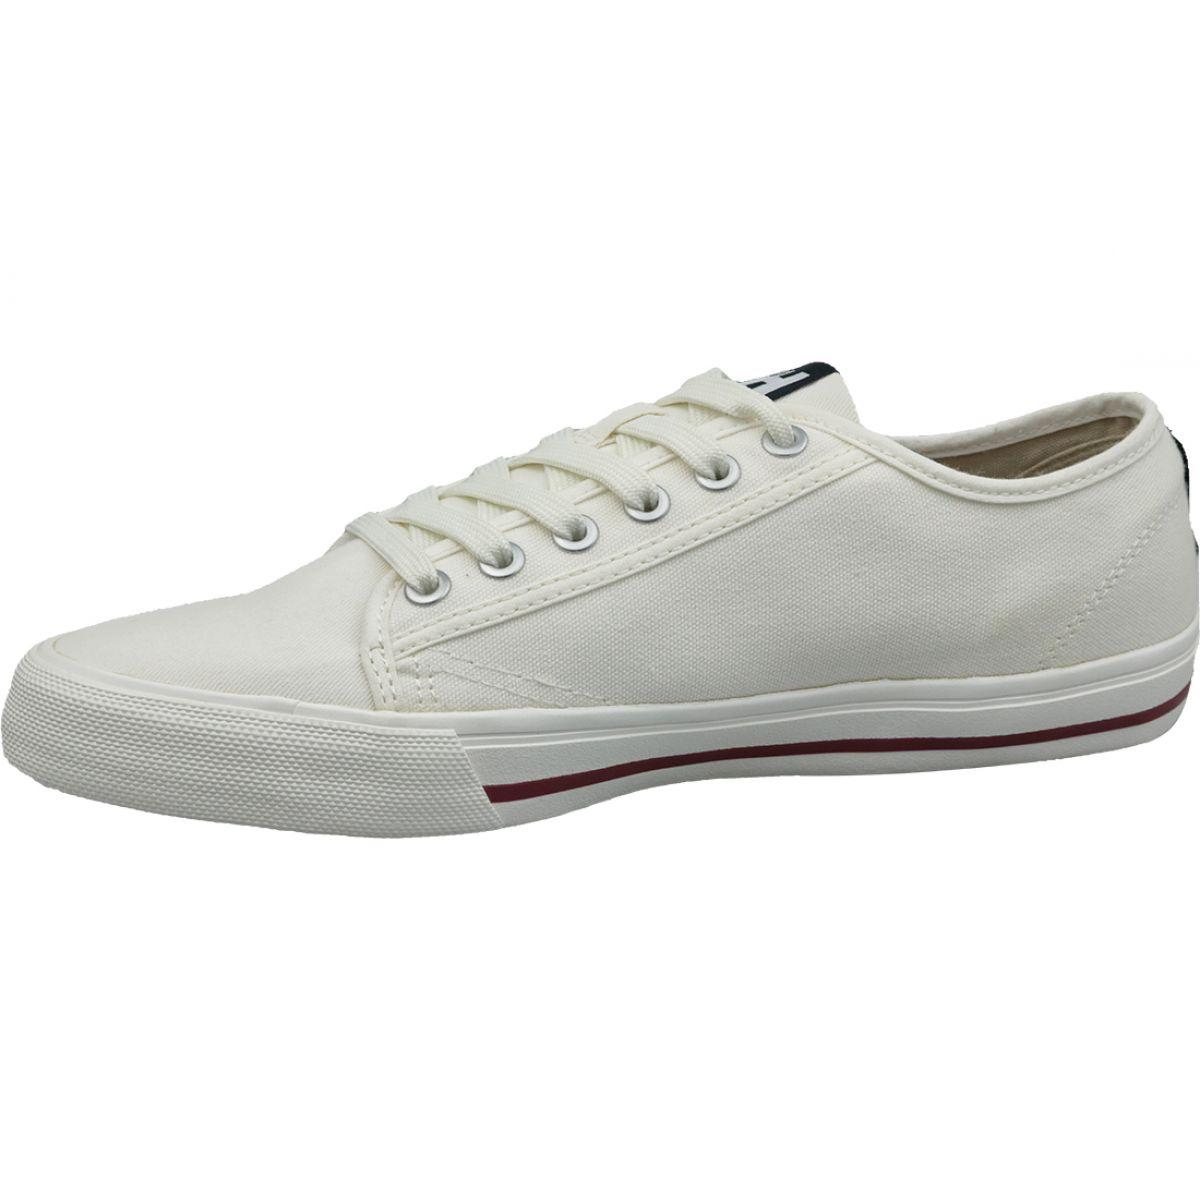 Helly Hansen Fjord vászoncipő V2 M 11465 597 cipő